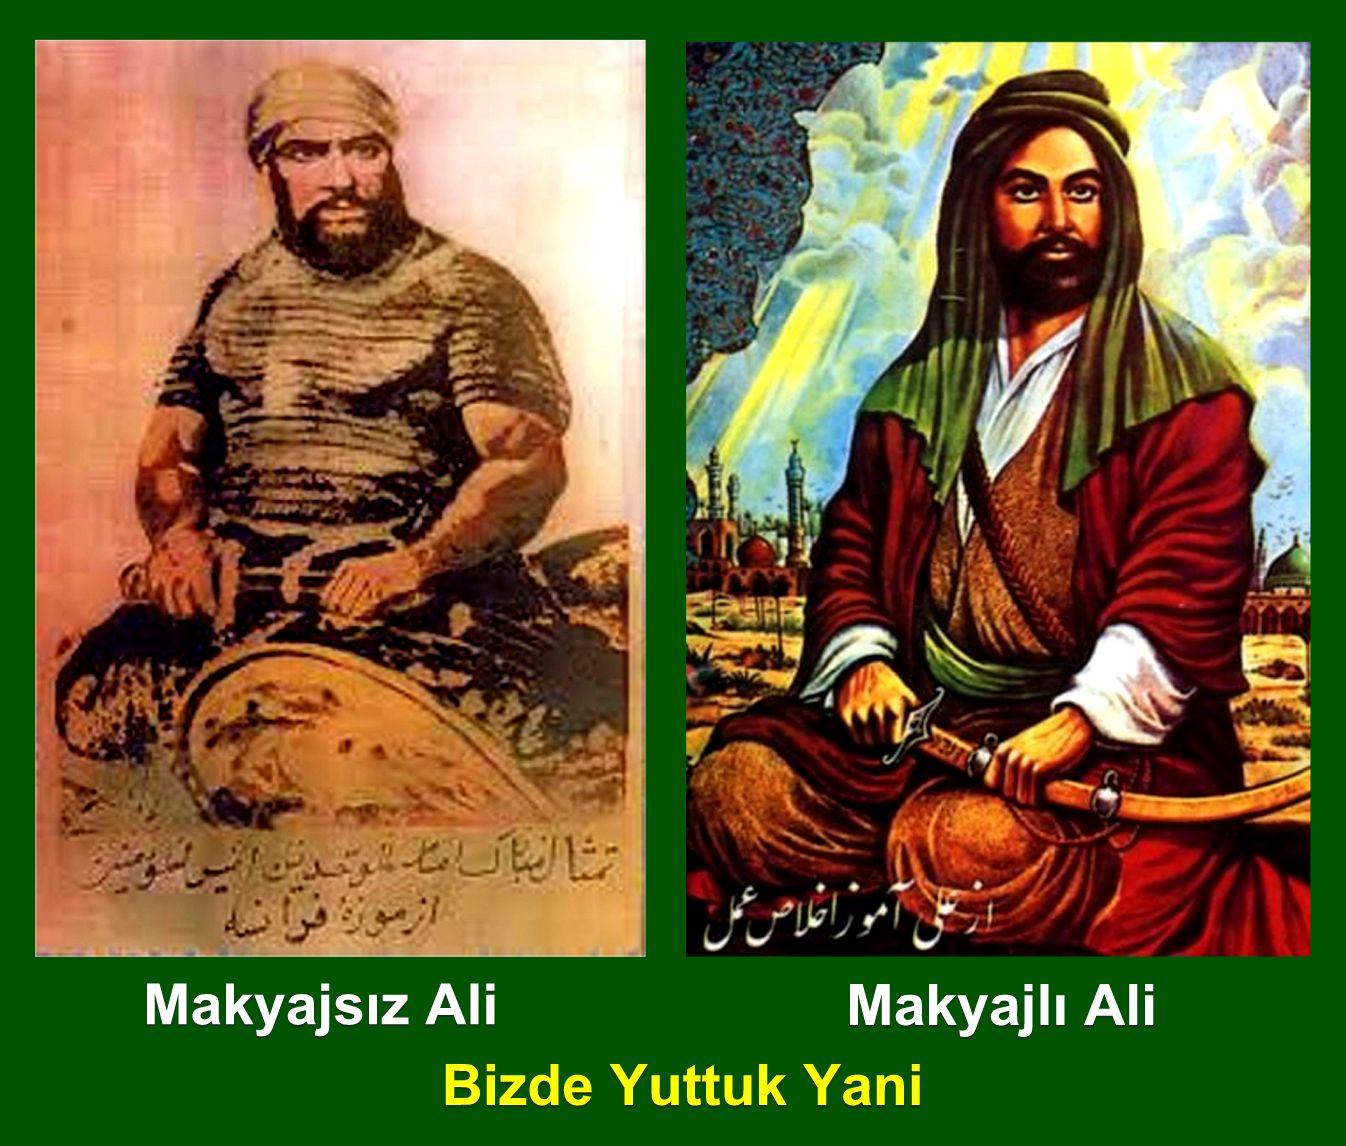 1 Hz imam Ali divani Alevi bektasi kizilbas pir sultan devrimci aleviler birligi DAB Feramuz Sah Acar bizde yuttuk yani makayli ali hz